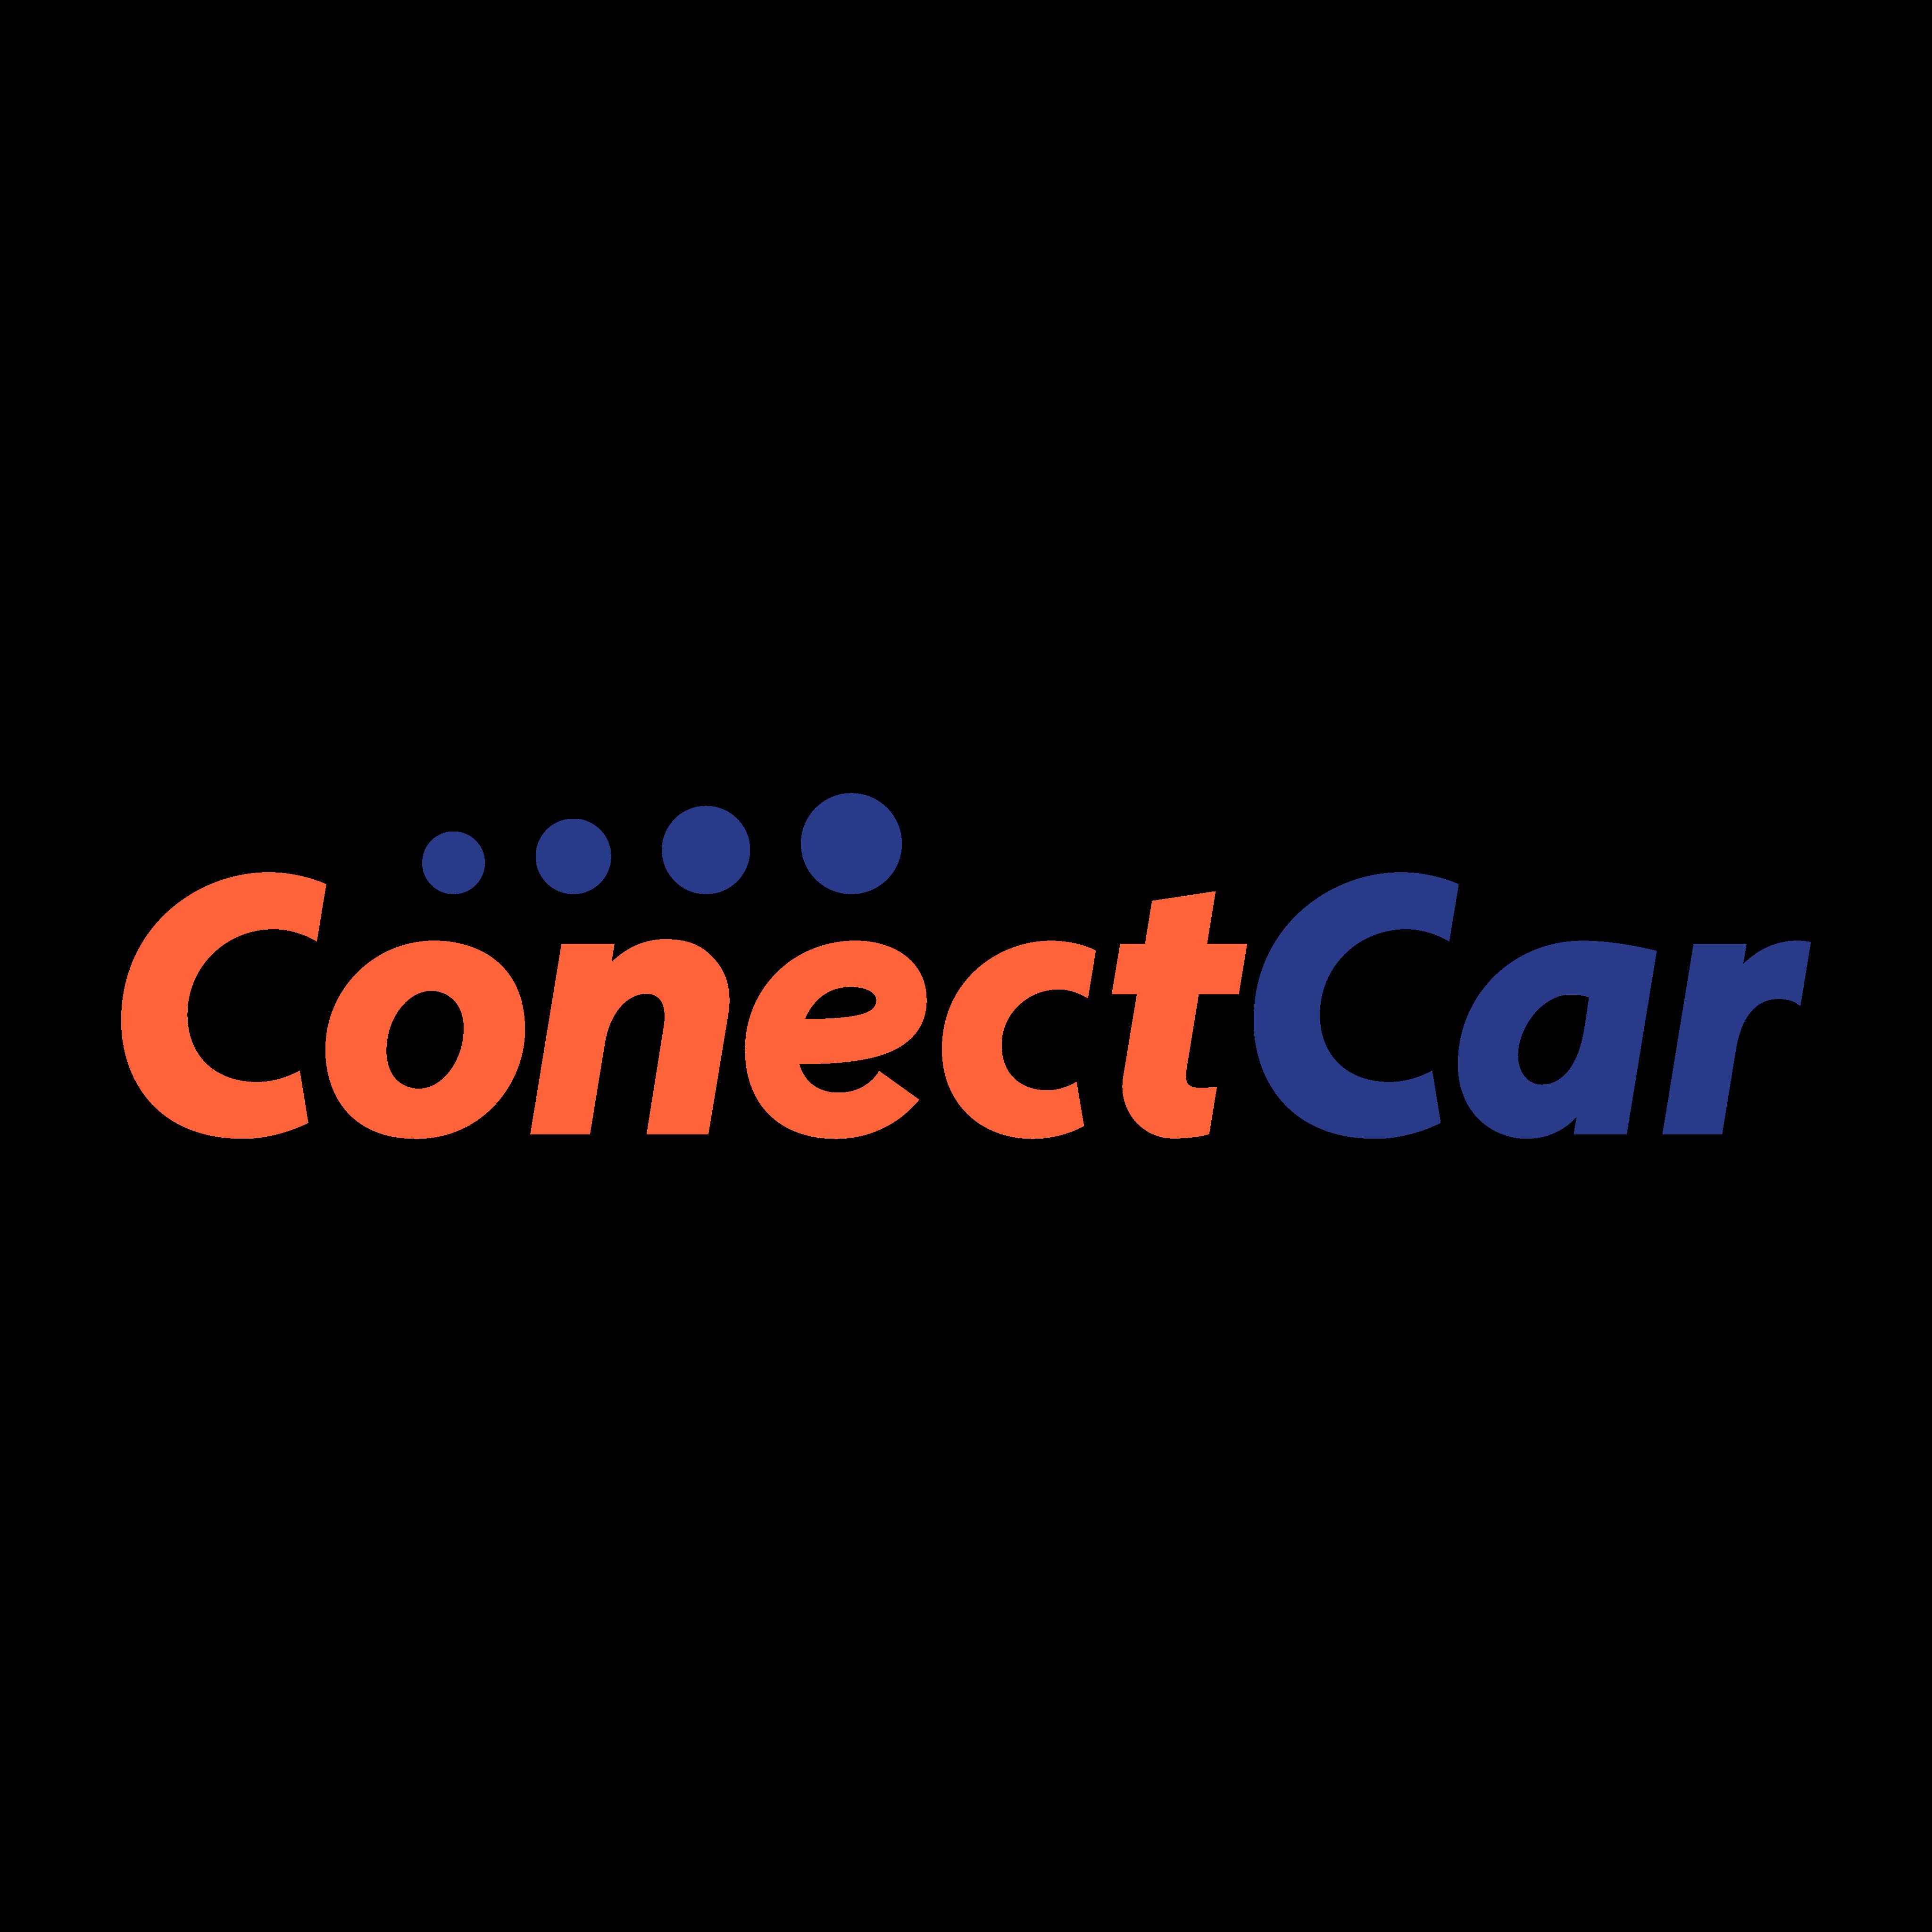 ConectCar logo PNG.